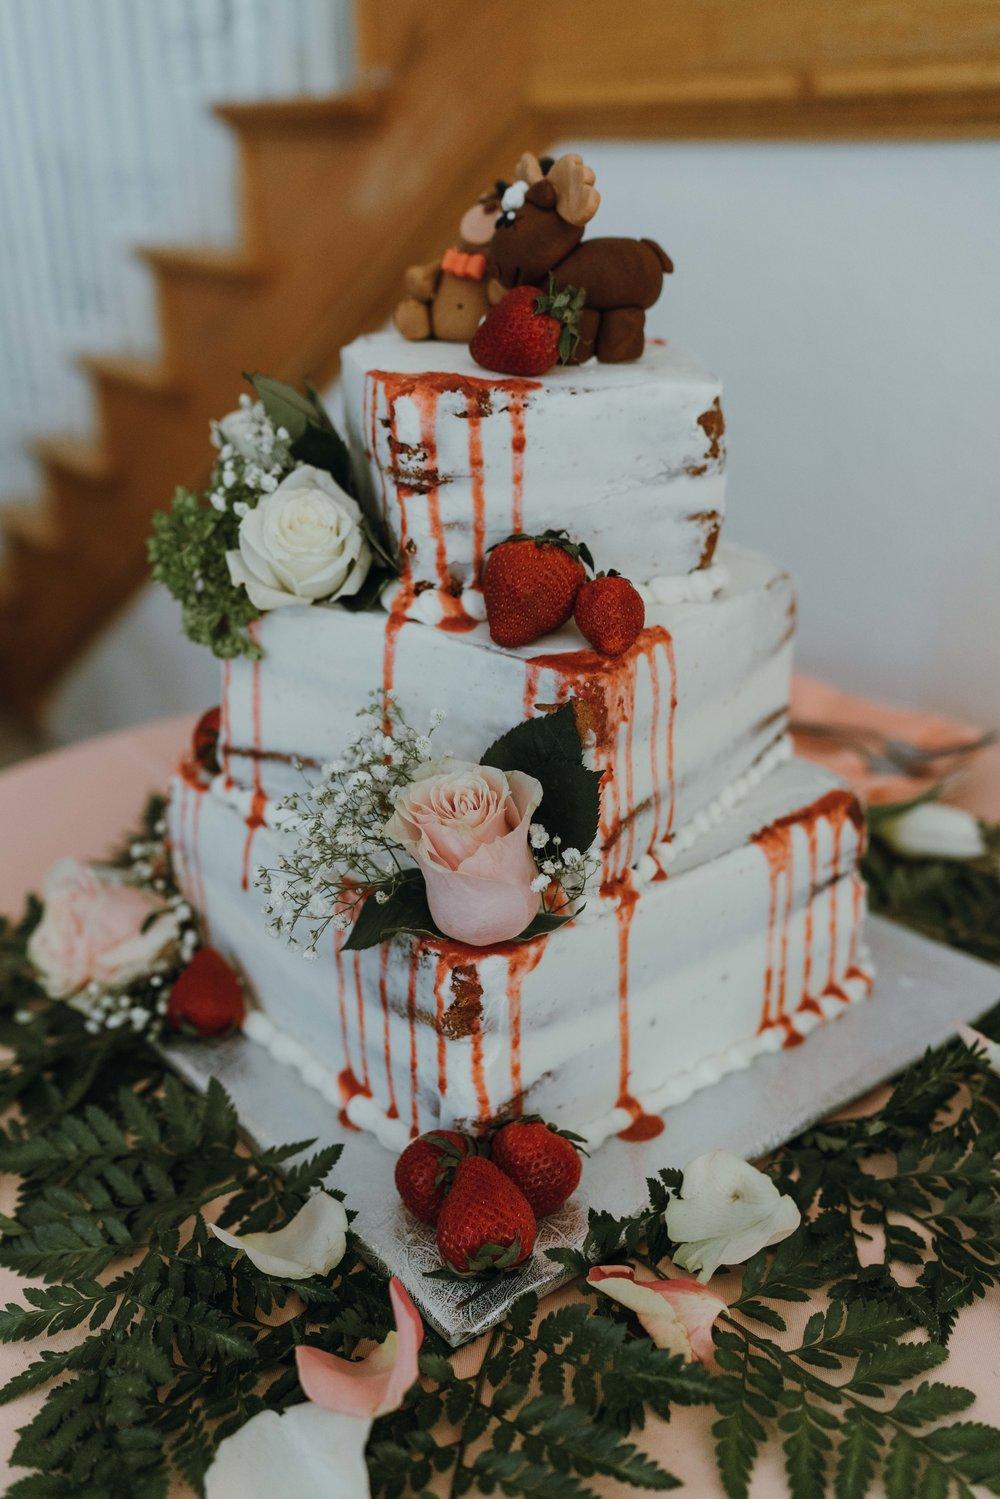 denver wedding photographer lioncrest manor in lyons ben and mali -DSC05912.jpg